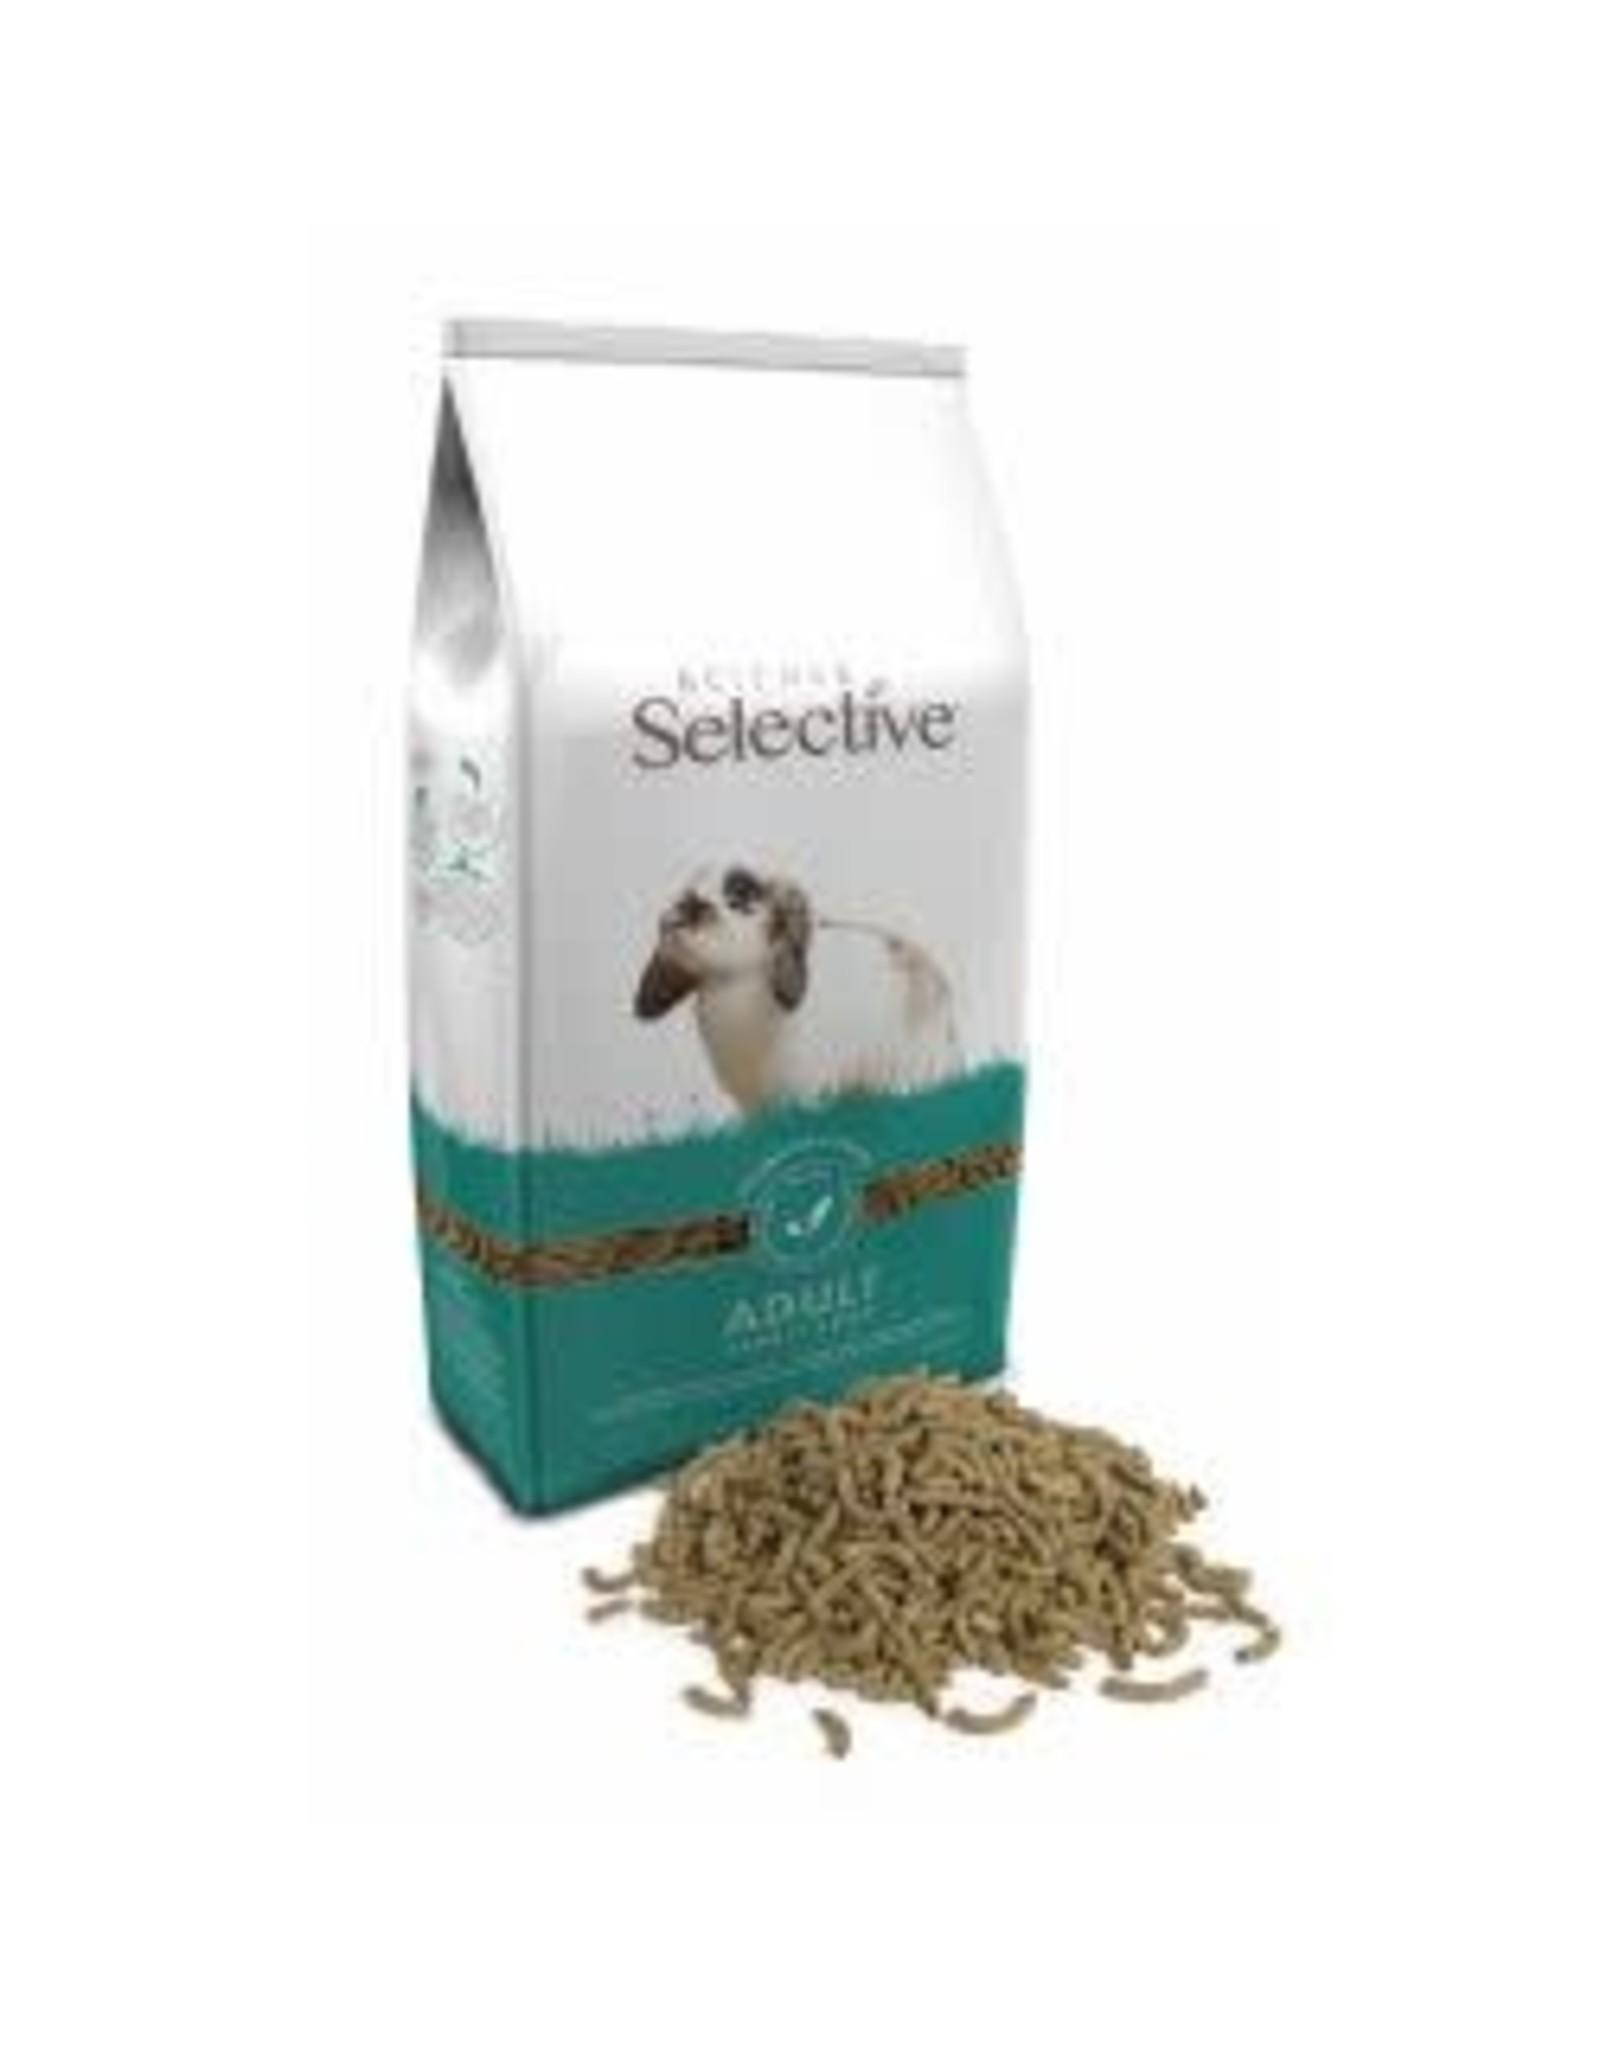 Selective Selective Rabbit 3kg